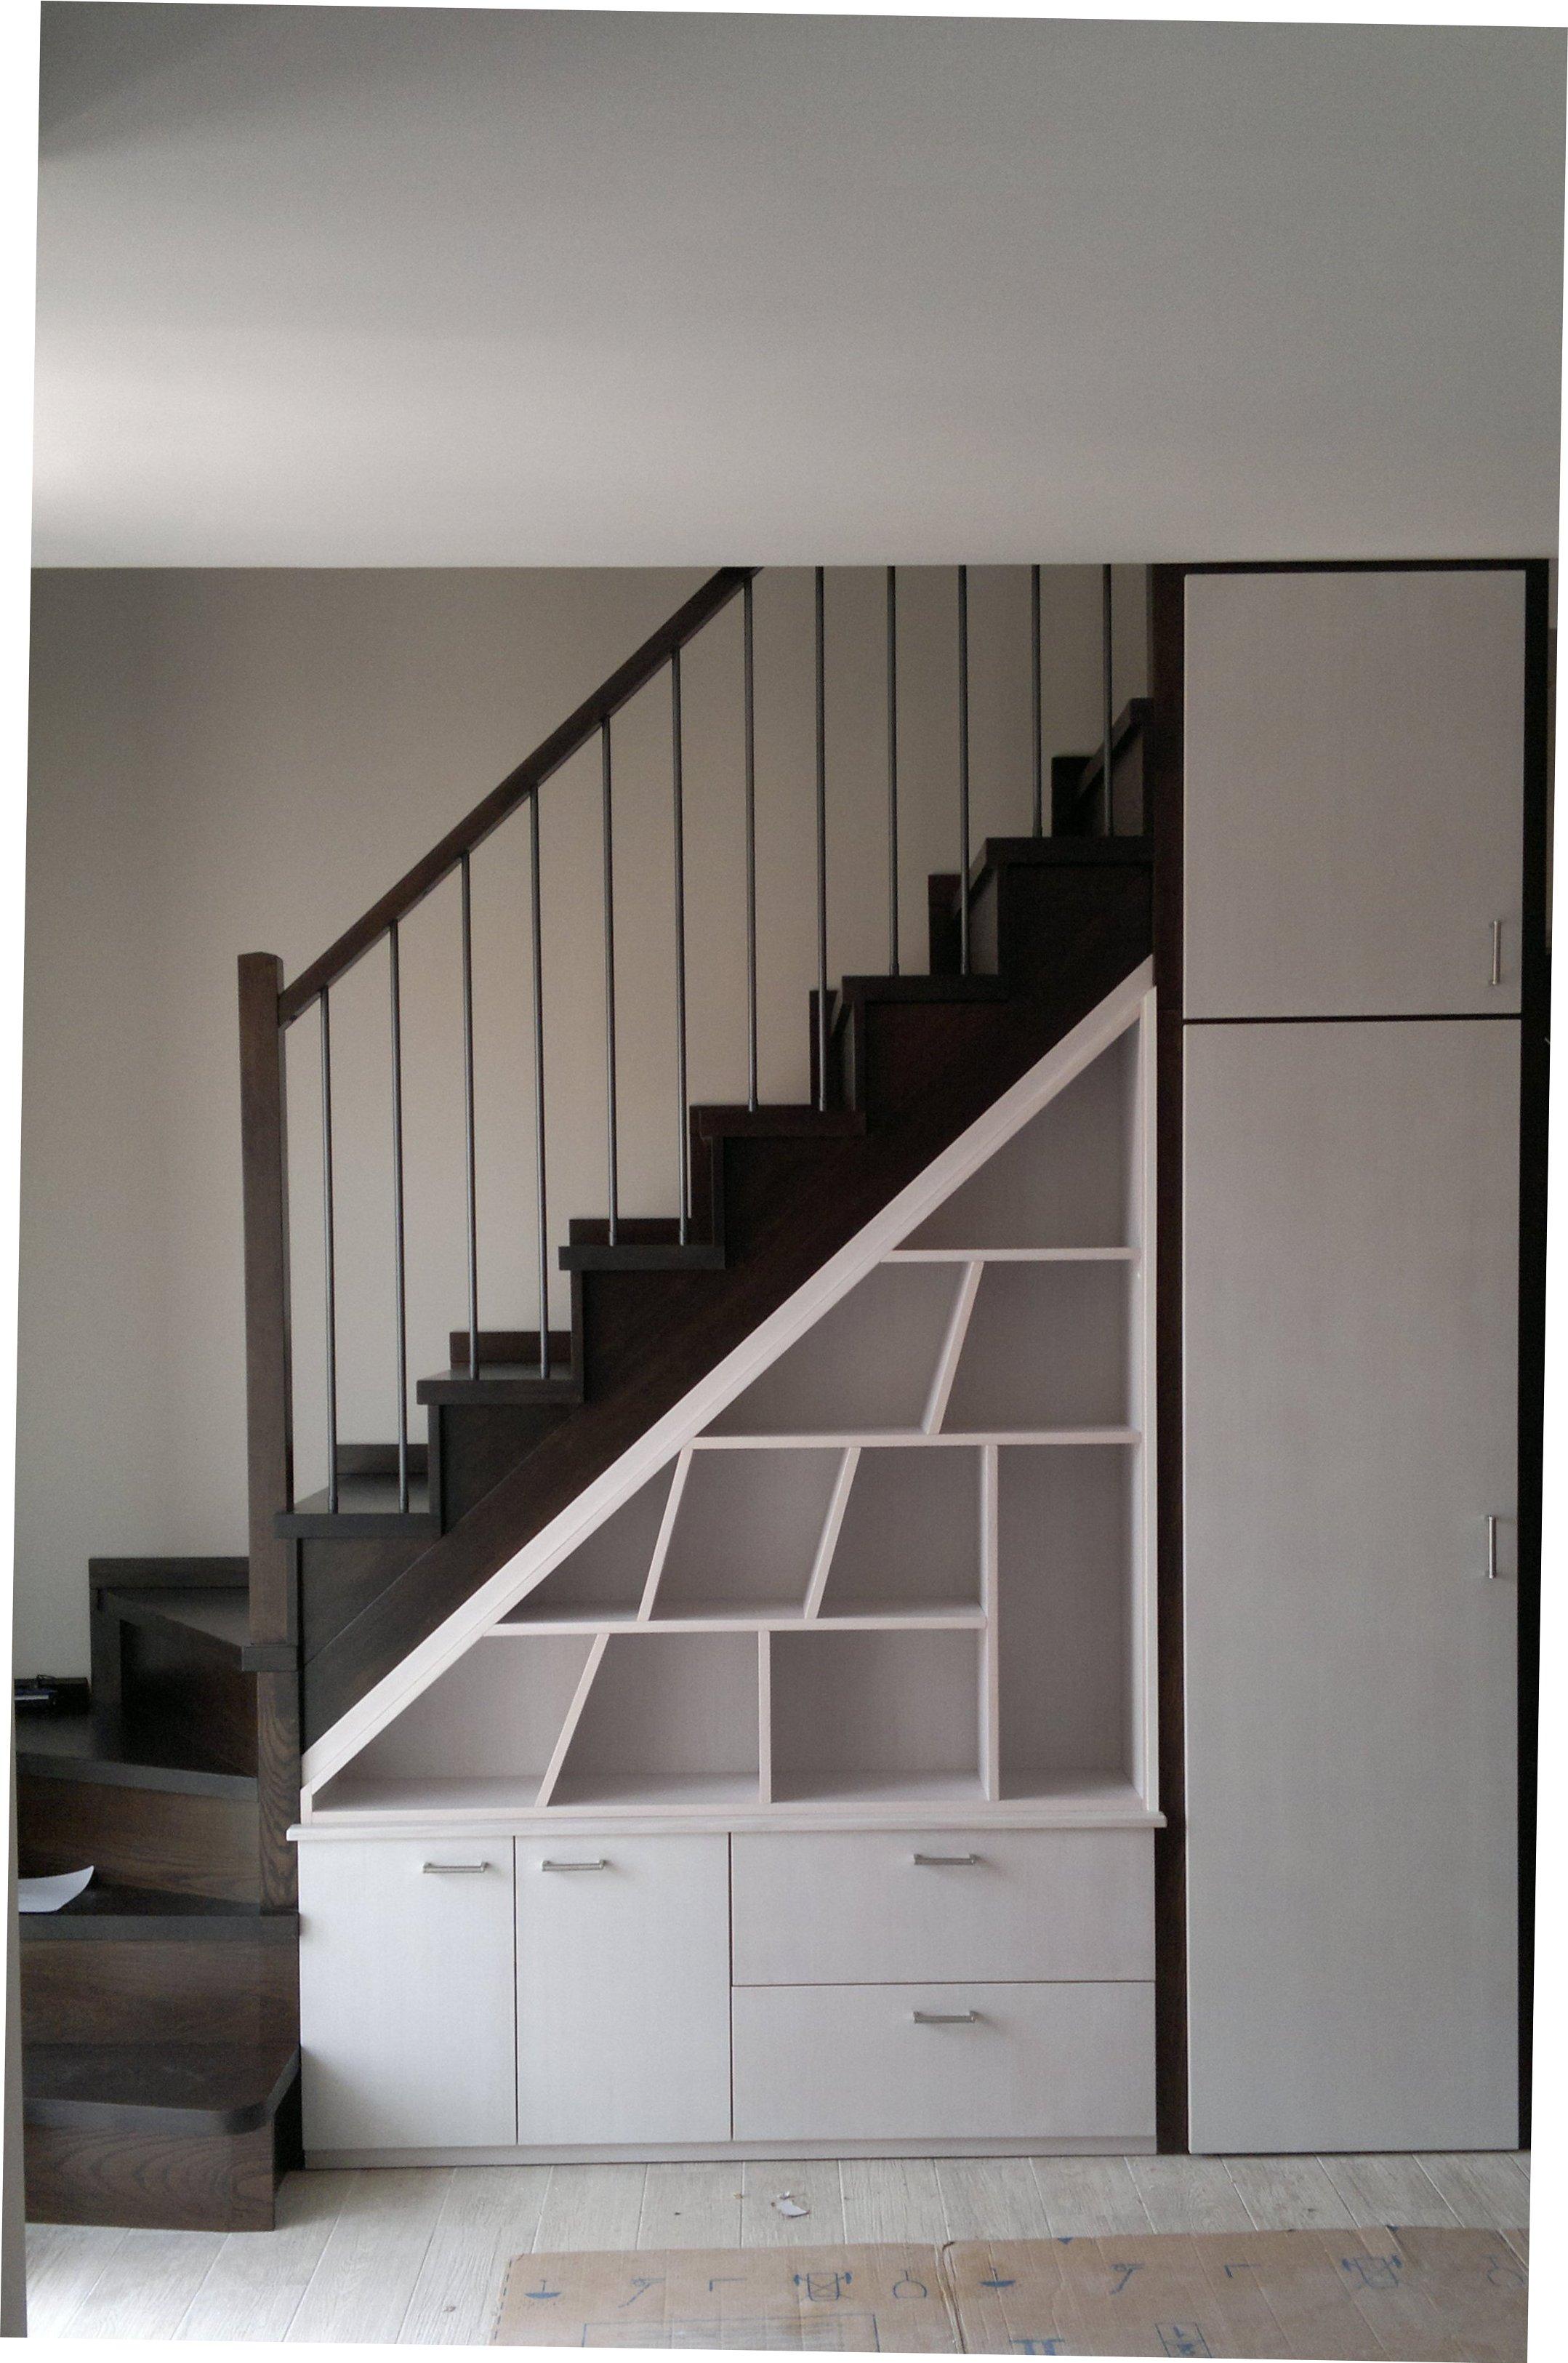 Casse per cucine e mobili in kit - MyBricoshop